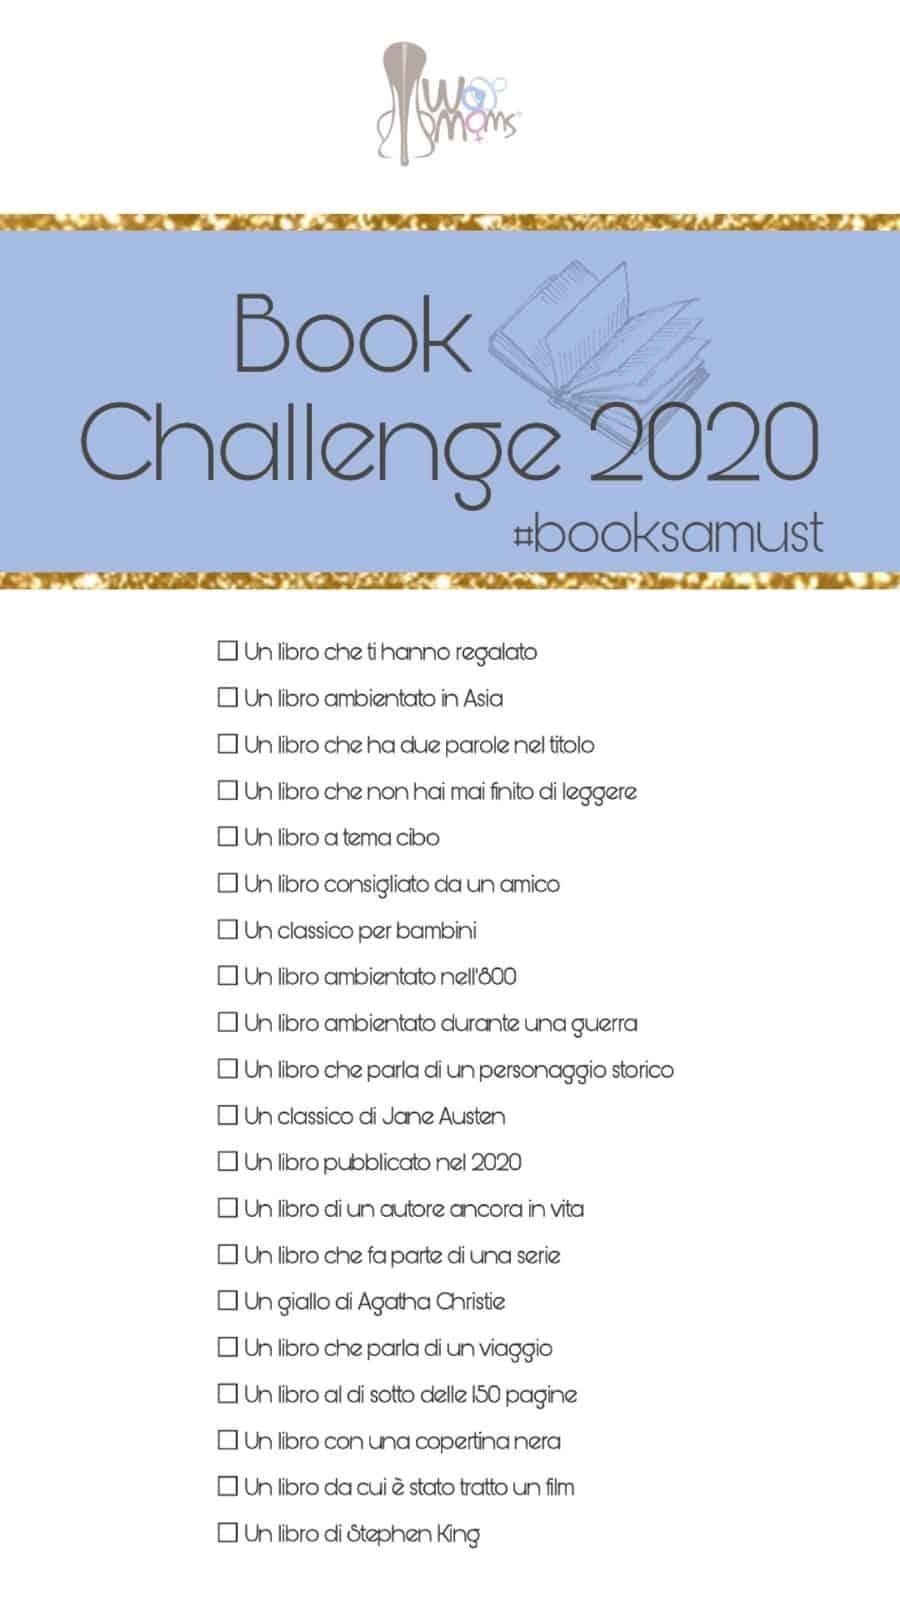 Womoms Book Challenge 2020, la nostra sfida!